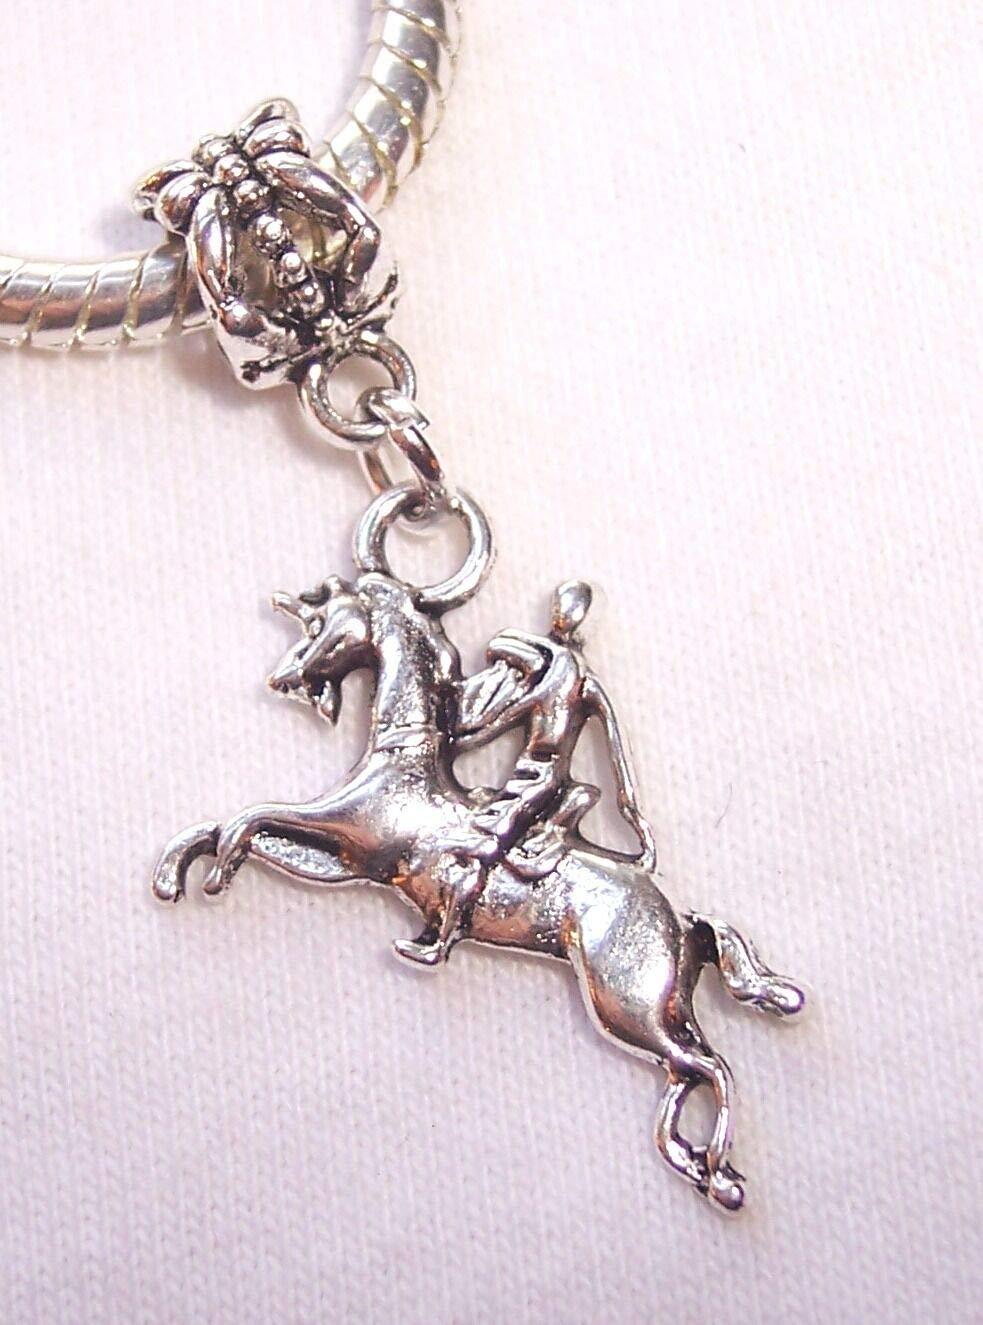 Knight on Horseback Horse Equestrian Medieval Dangle Charm for European Bracelet Fashion Jewelry for Women Man